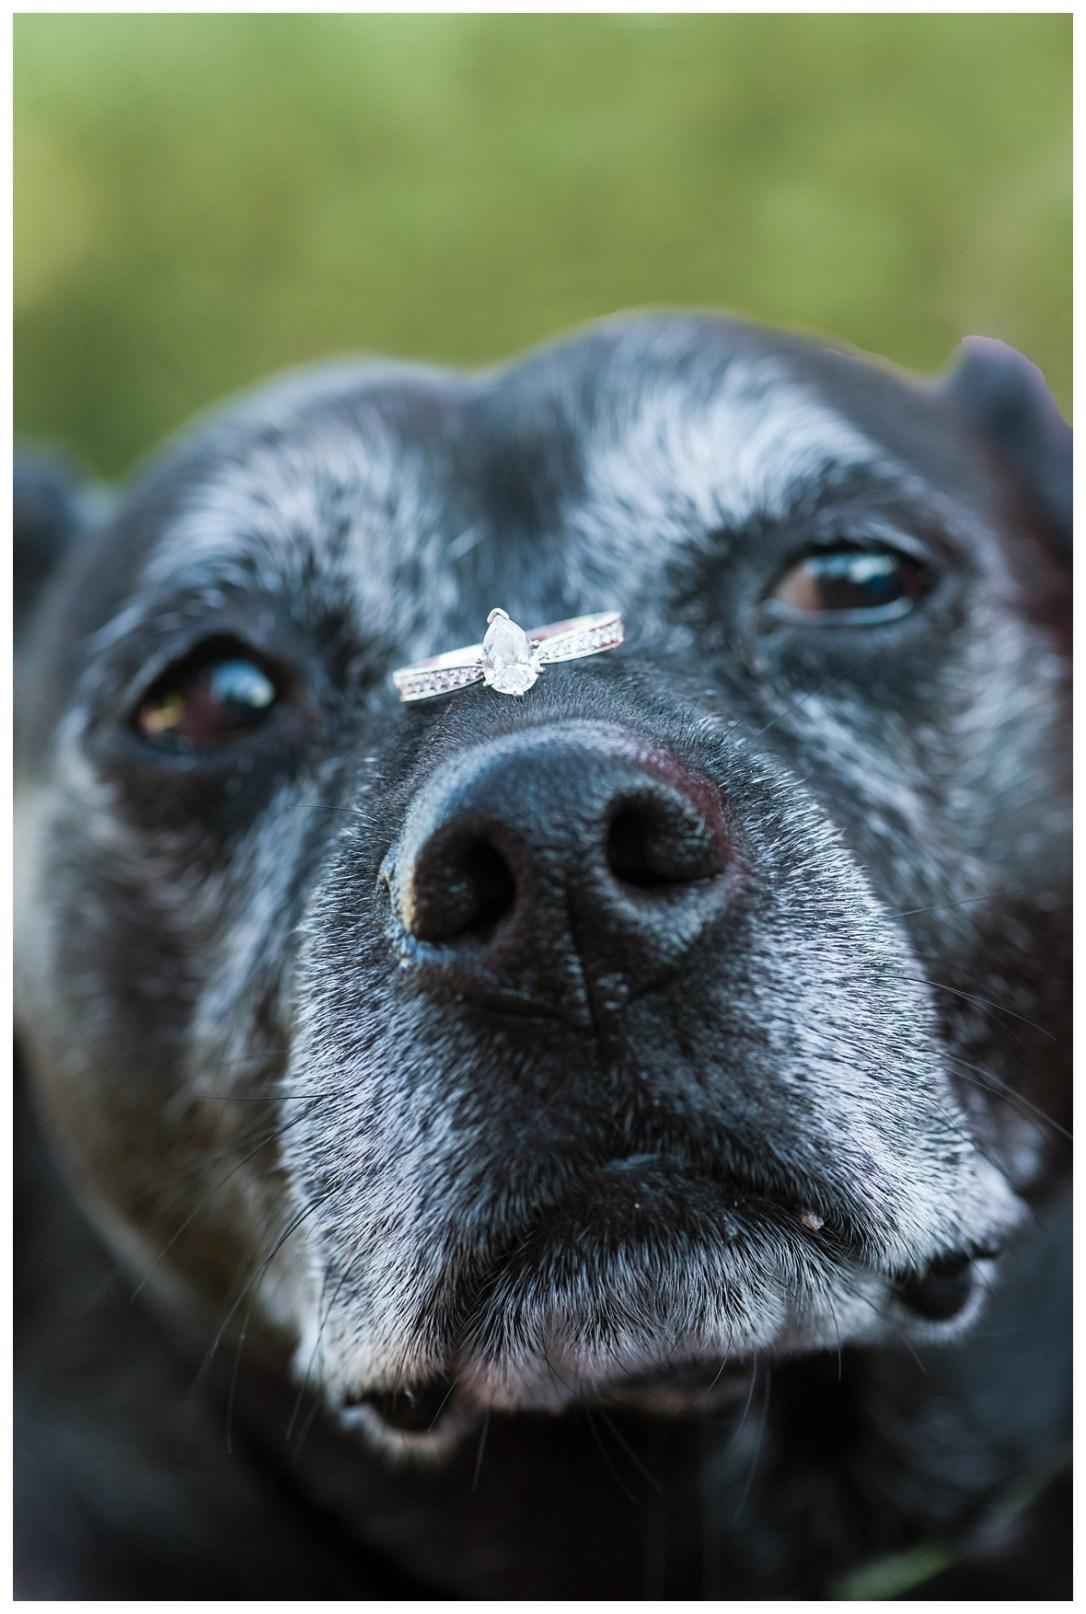 ring on senior dog nose